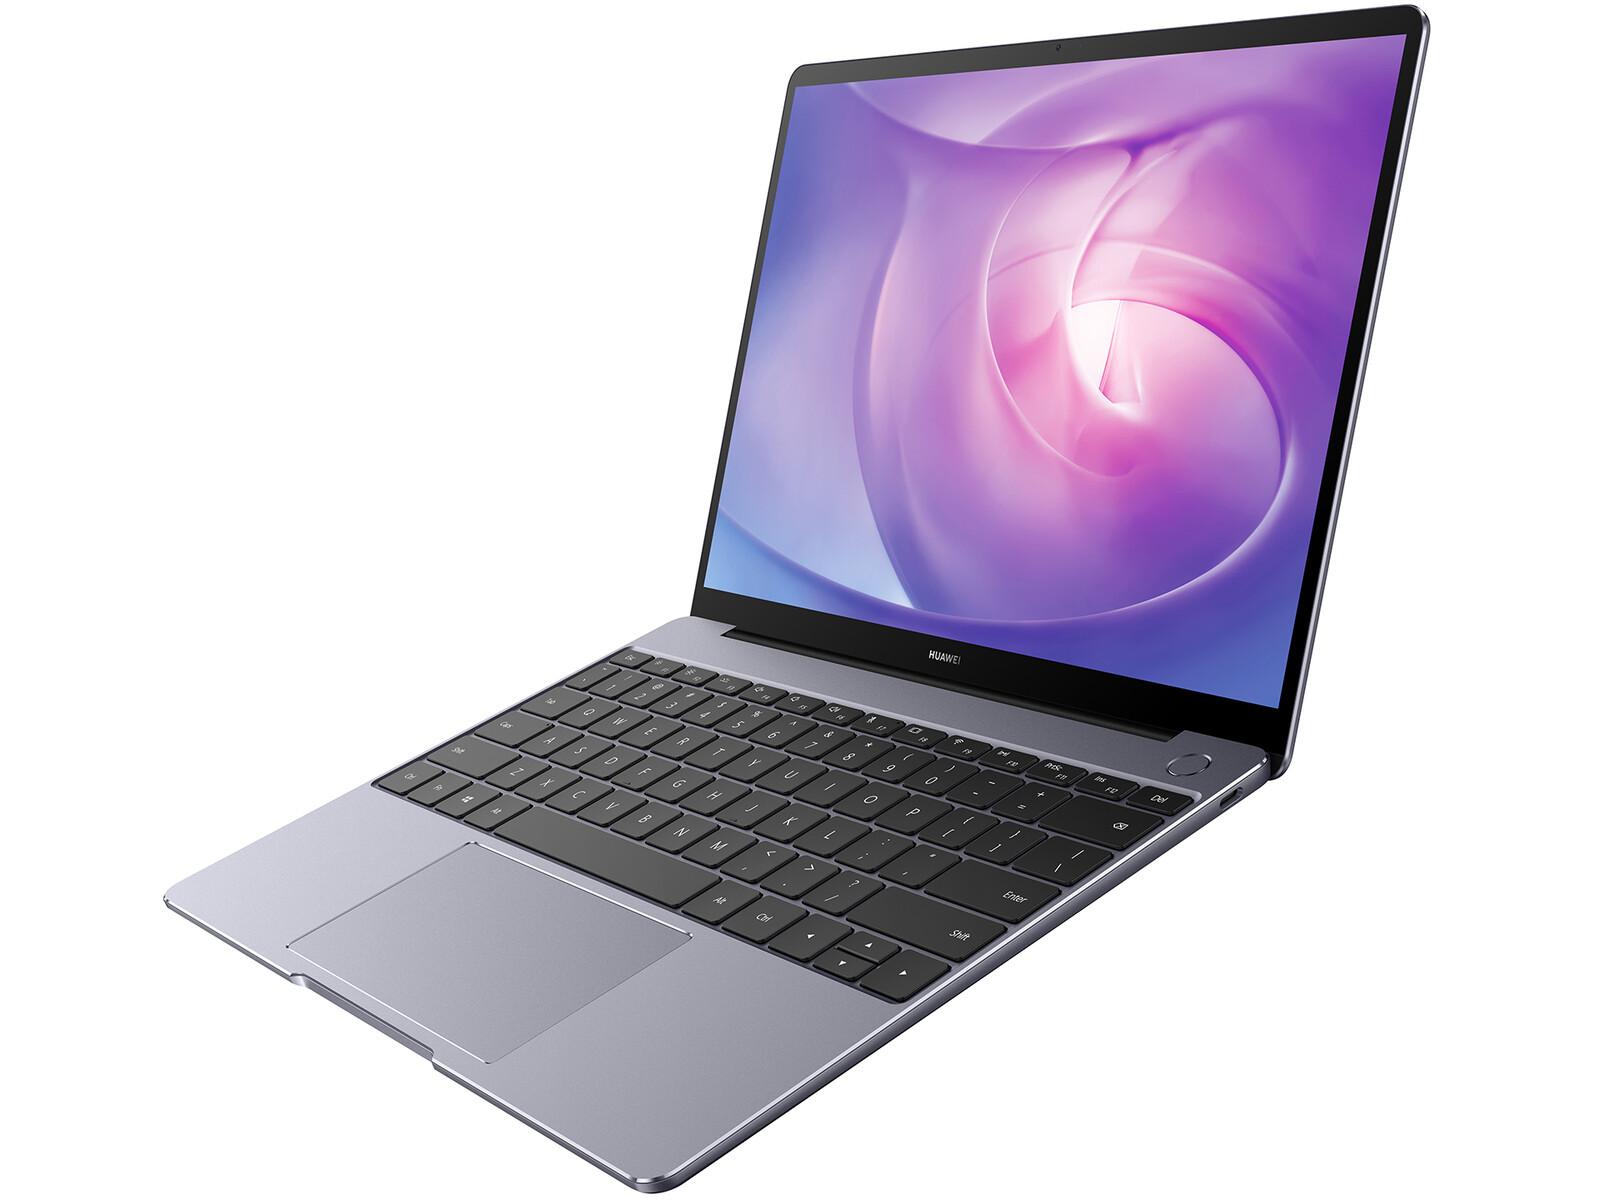 Huawei MateBook 13 (13-inch, 2020)